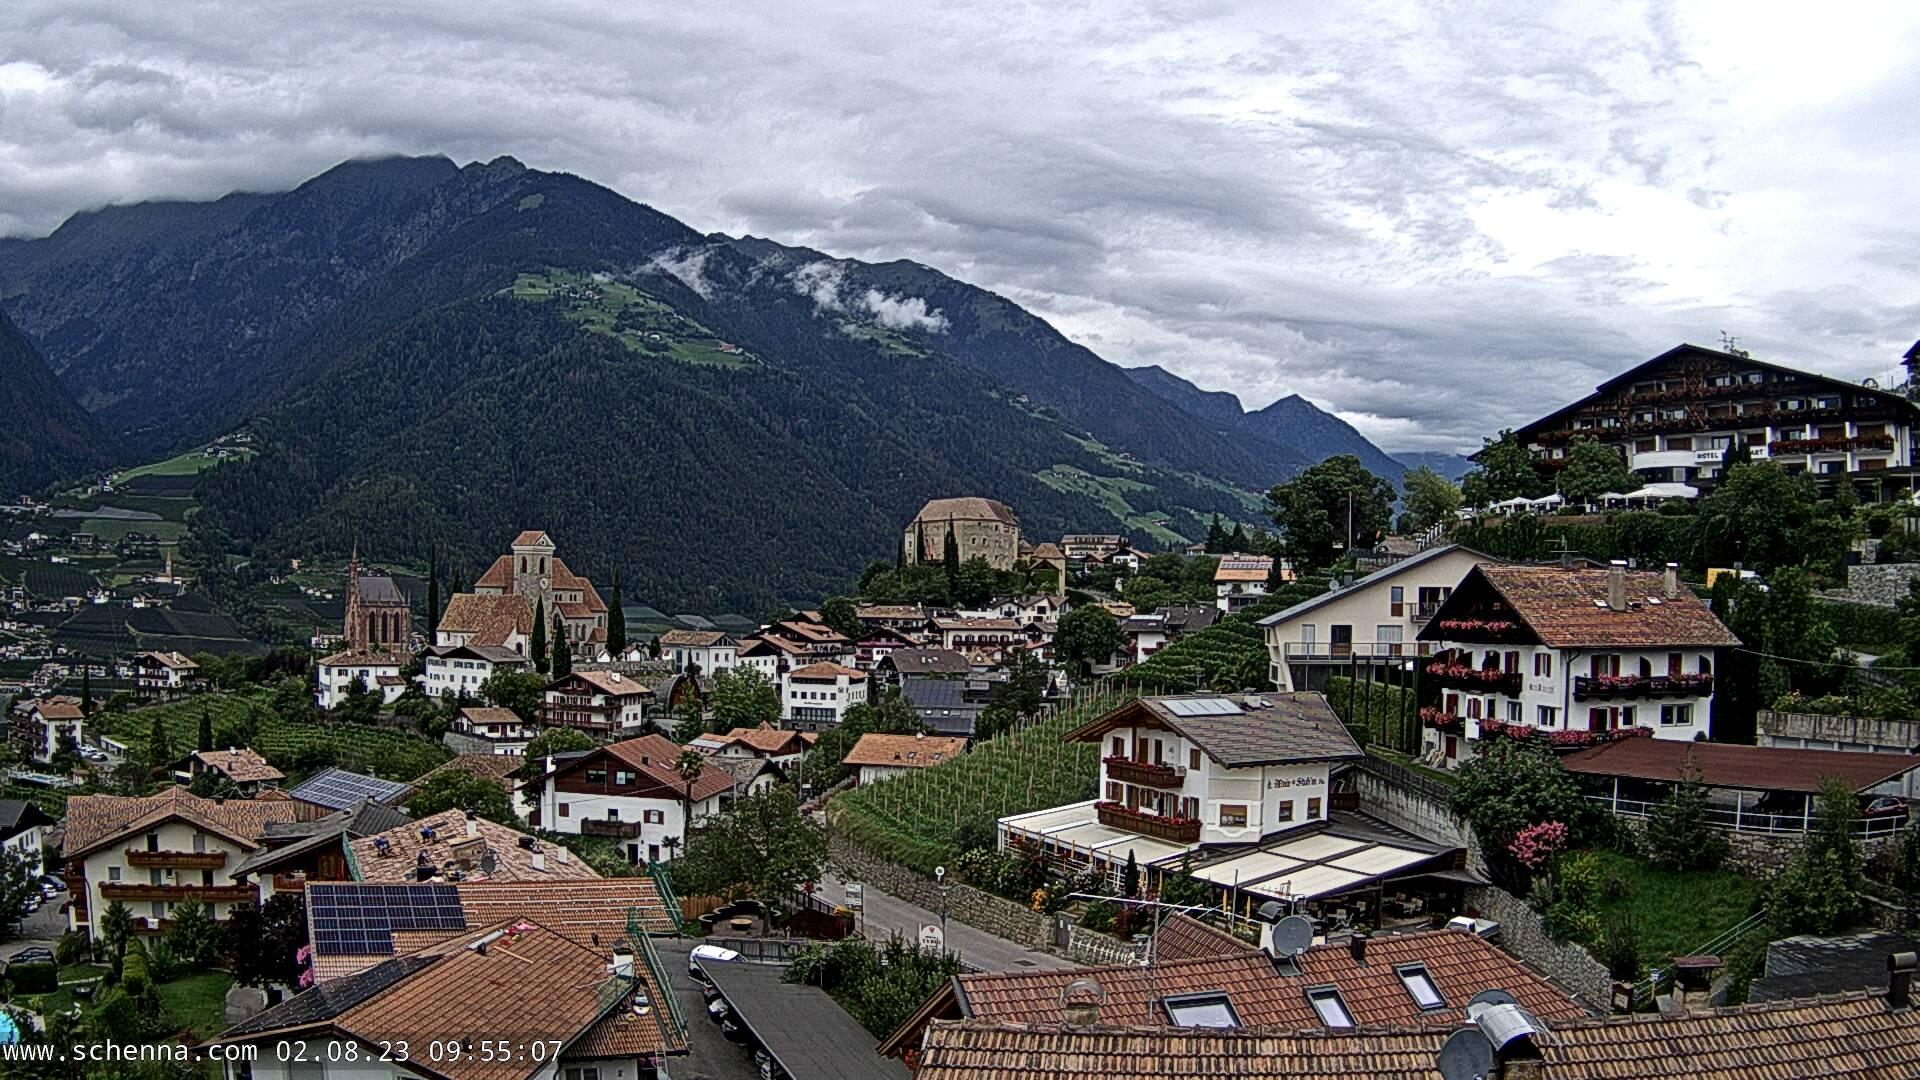 View on the village centre, in the background Hahnenkamm